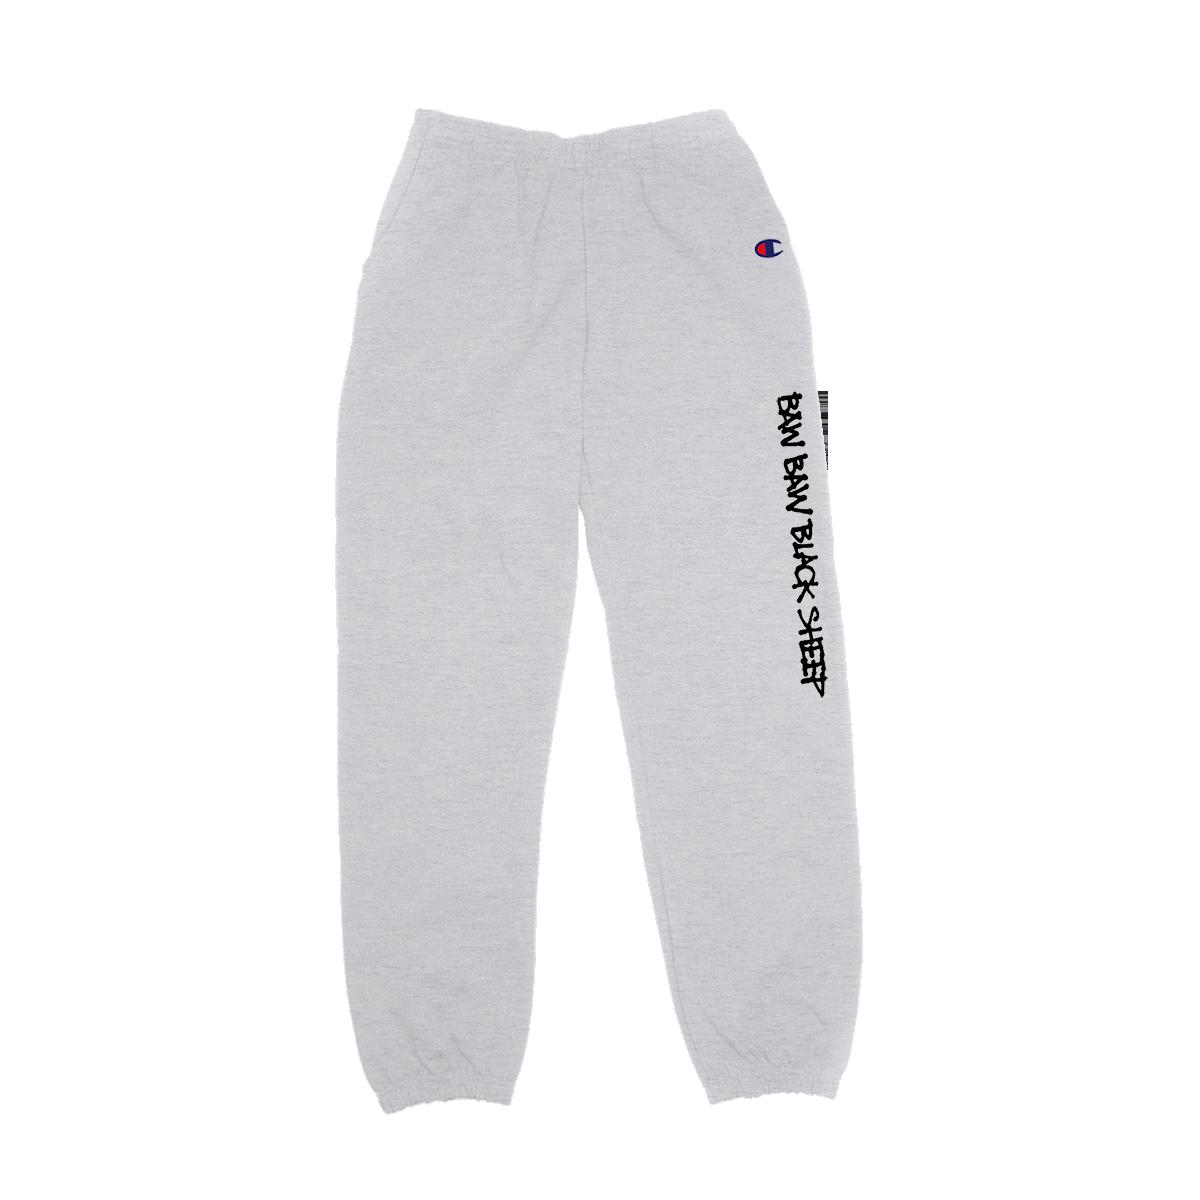 Black Sheep Sweatpants